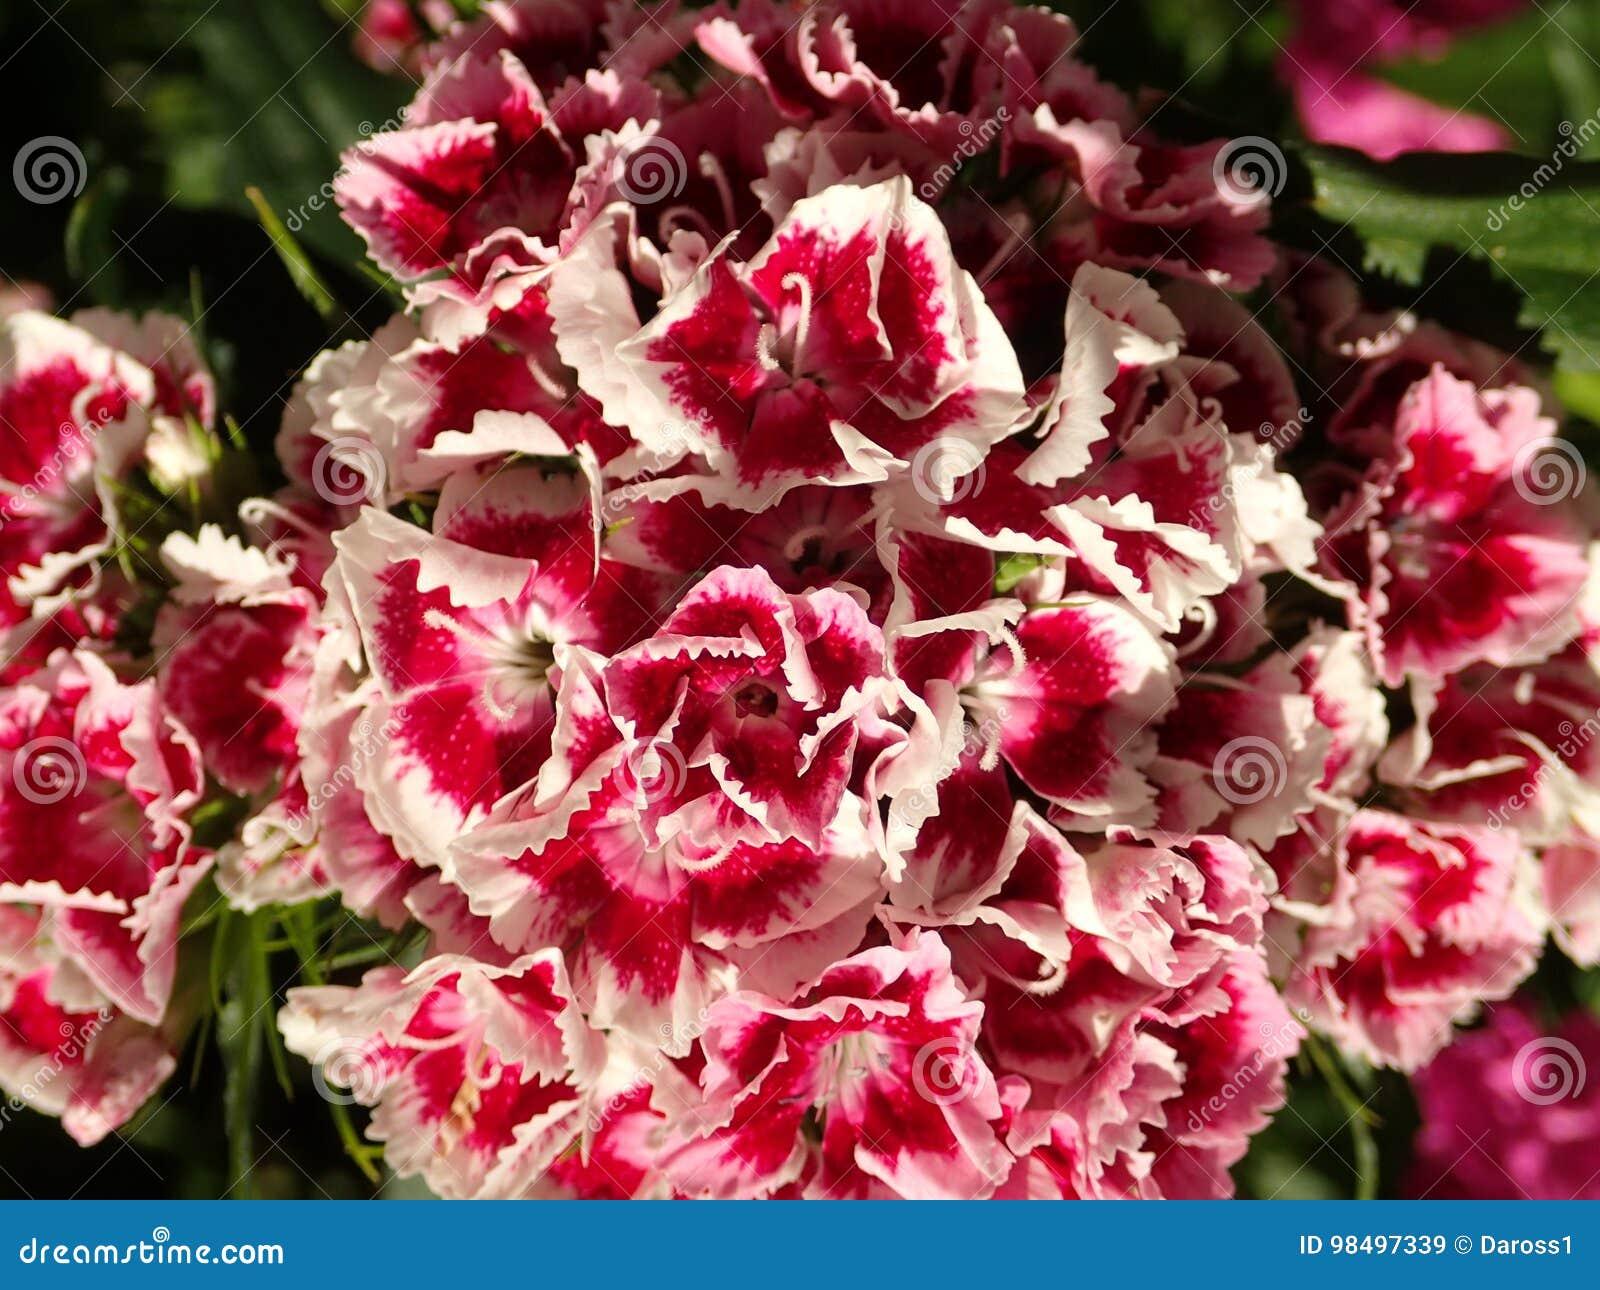 Macro Shot Of Sweet William Flowers Stock Image Image Of Pink